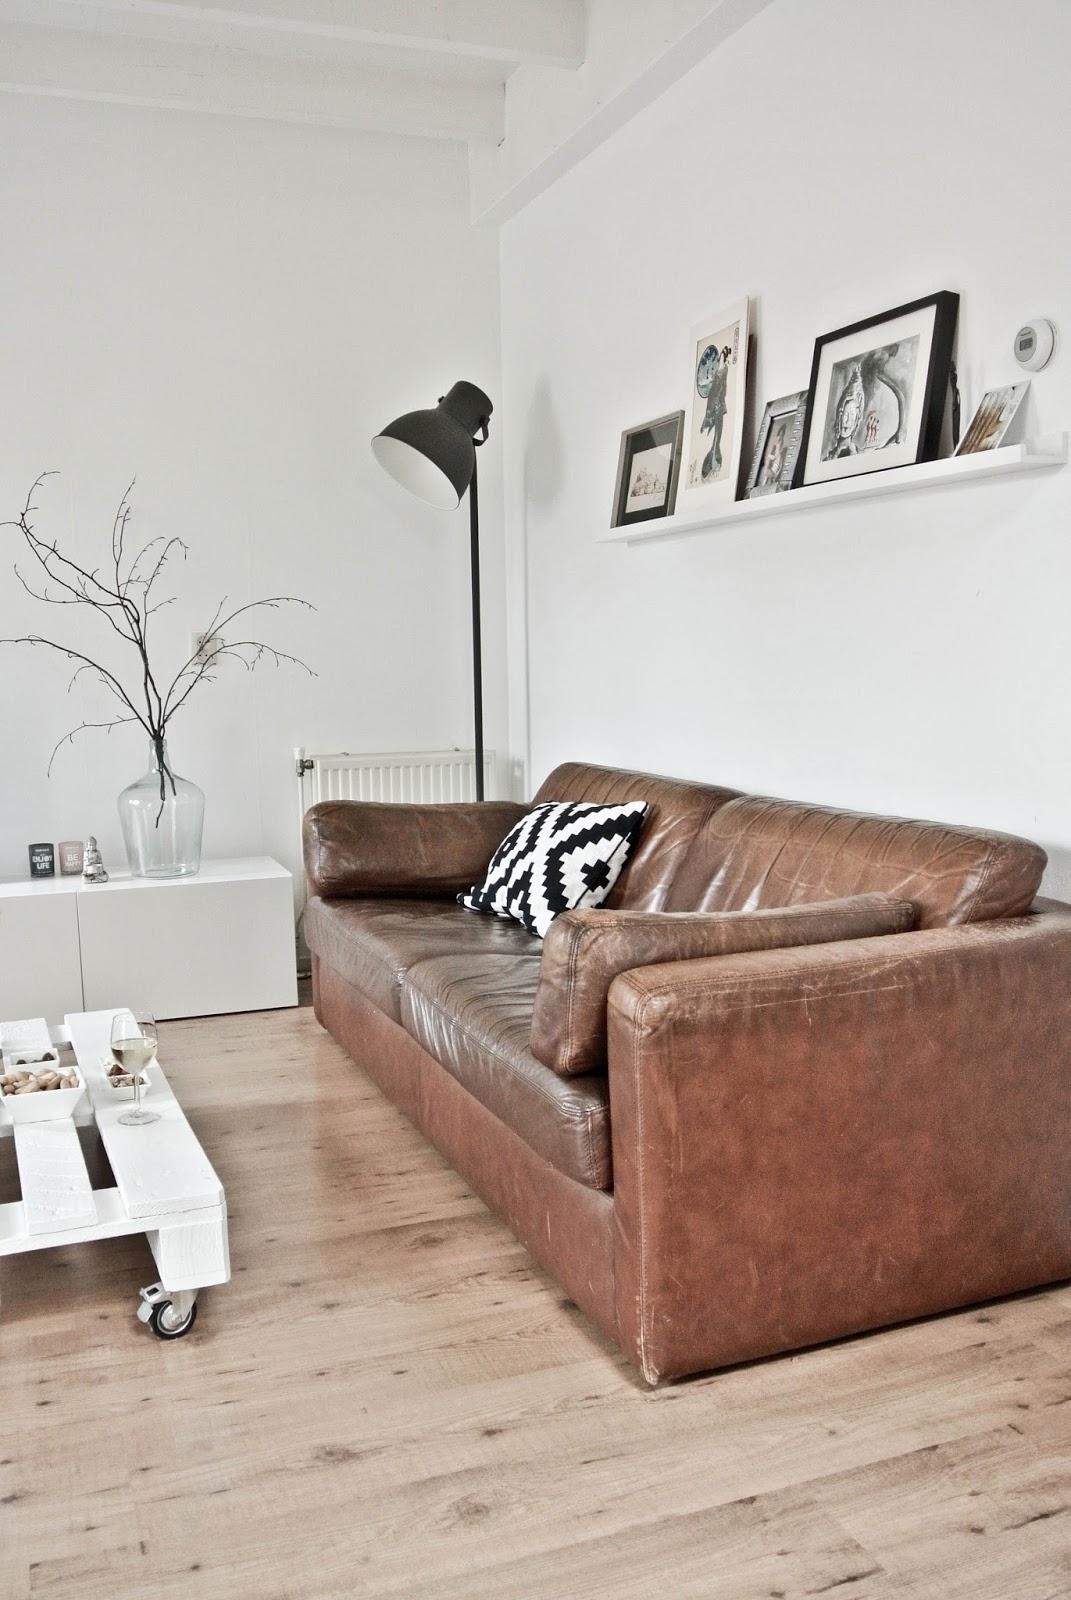 Living Room With Brown Leather Sofa Sofascore Barcelona Vs Juventus Lekker Fris